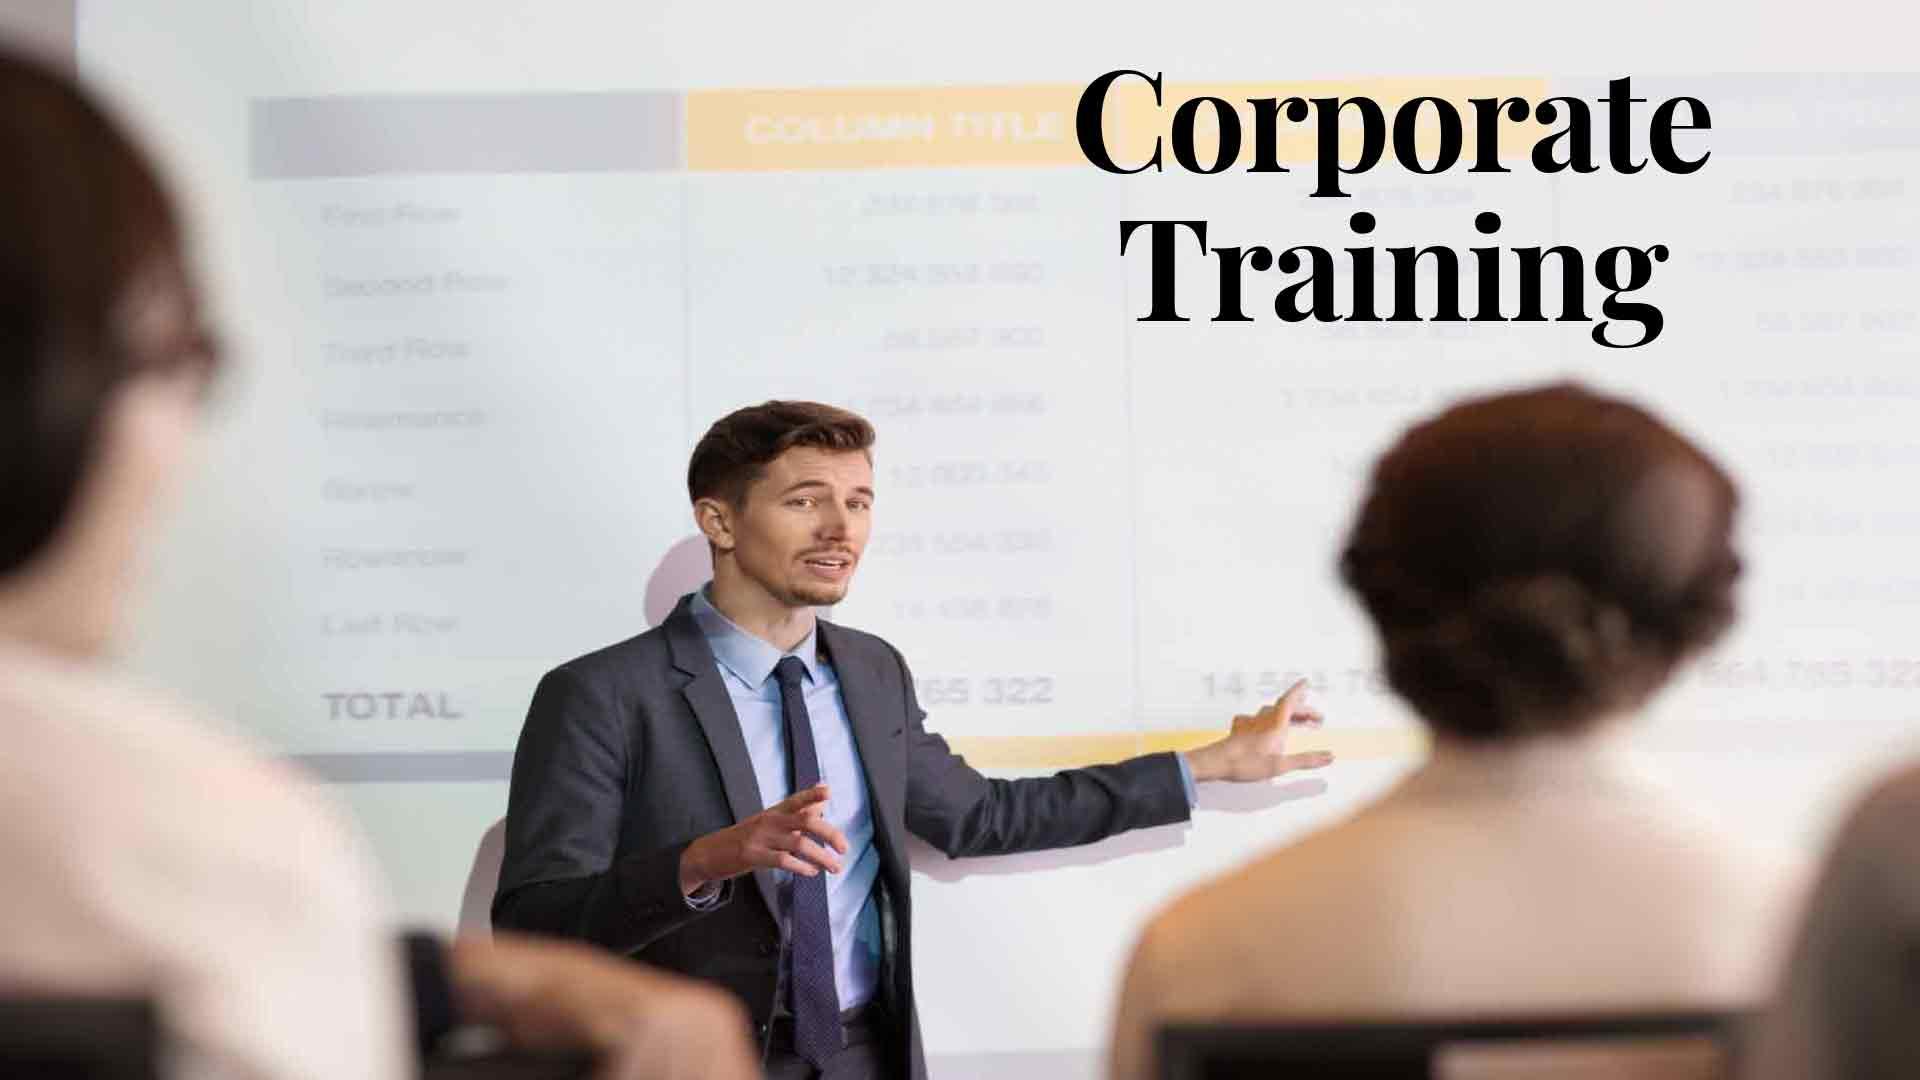 Corporate Training in Nagpur - Corporate Training | Dr ...